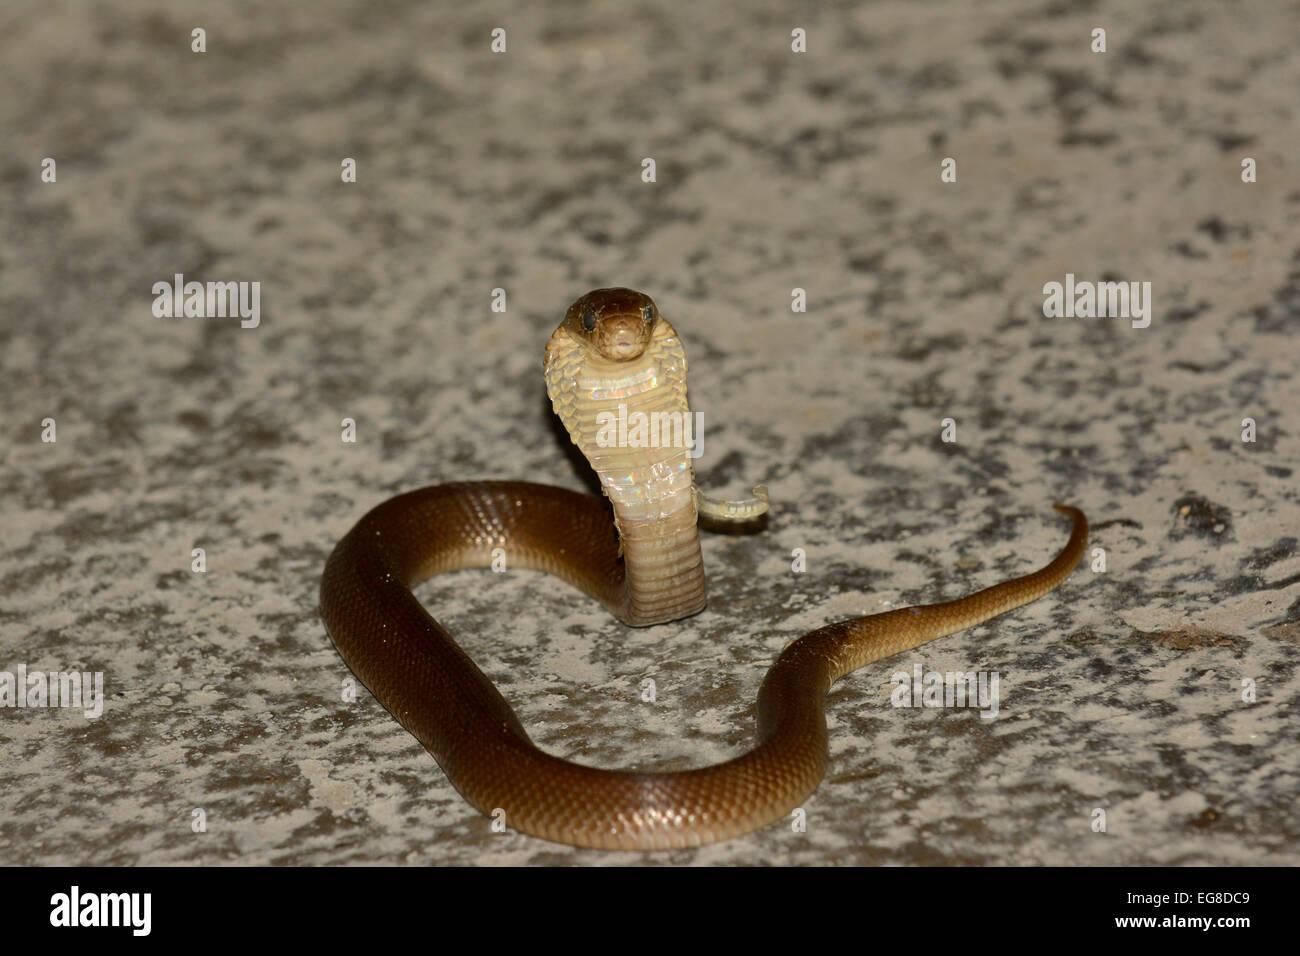 Javan Spitting Cobra (Naja sputatrix) juvenile, deadly venomous, Bali, Indonesia, October - Stock Image